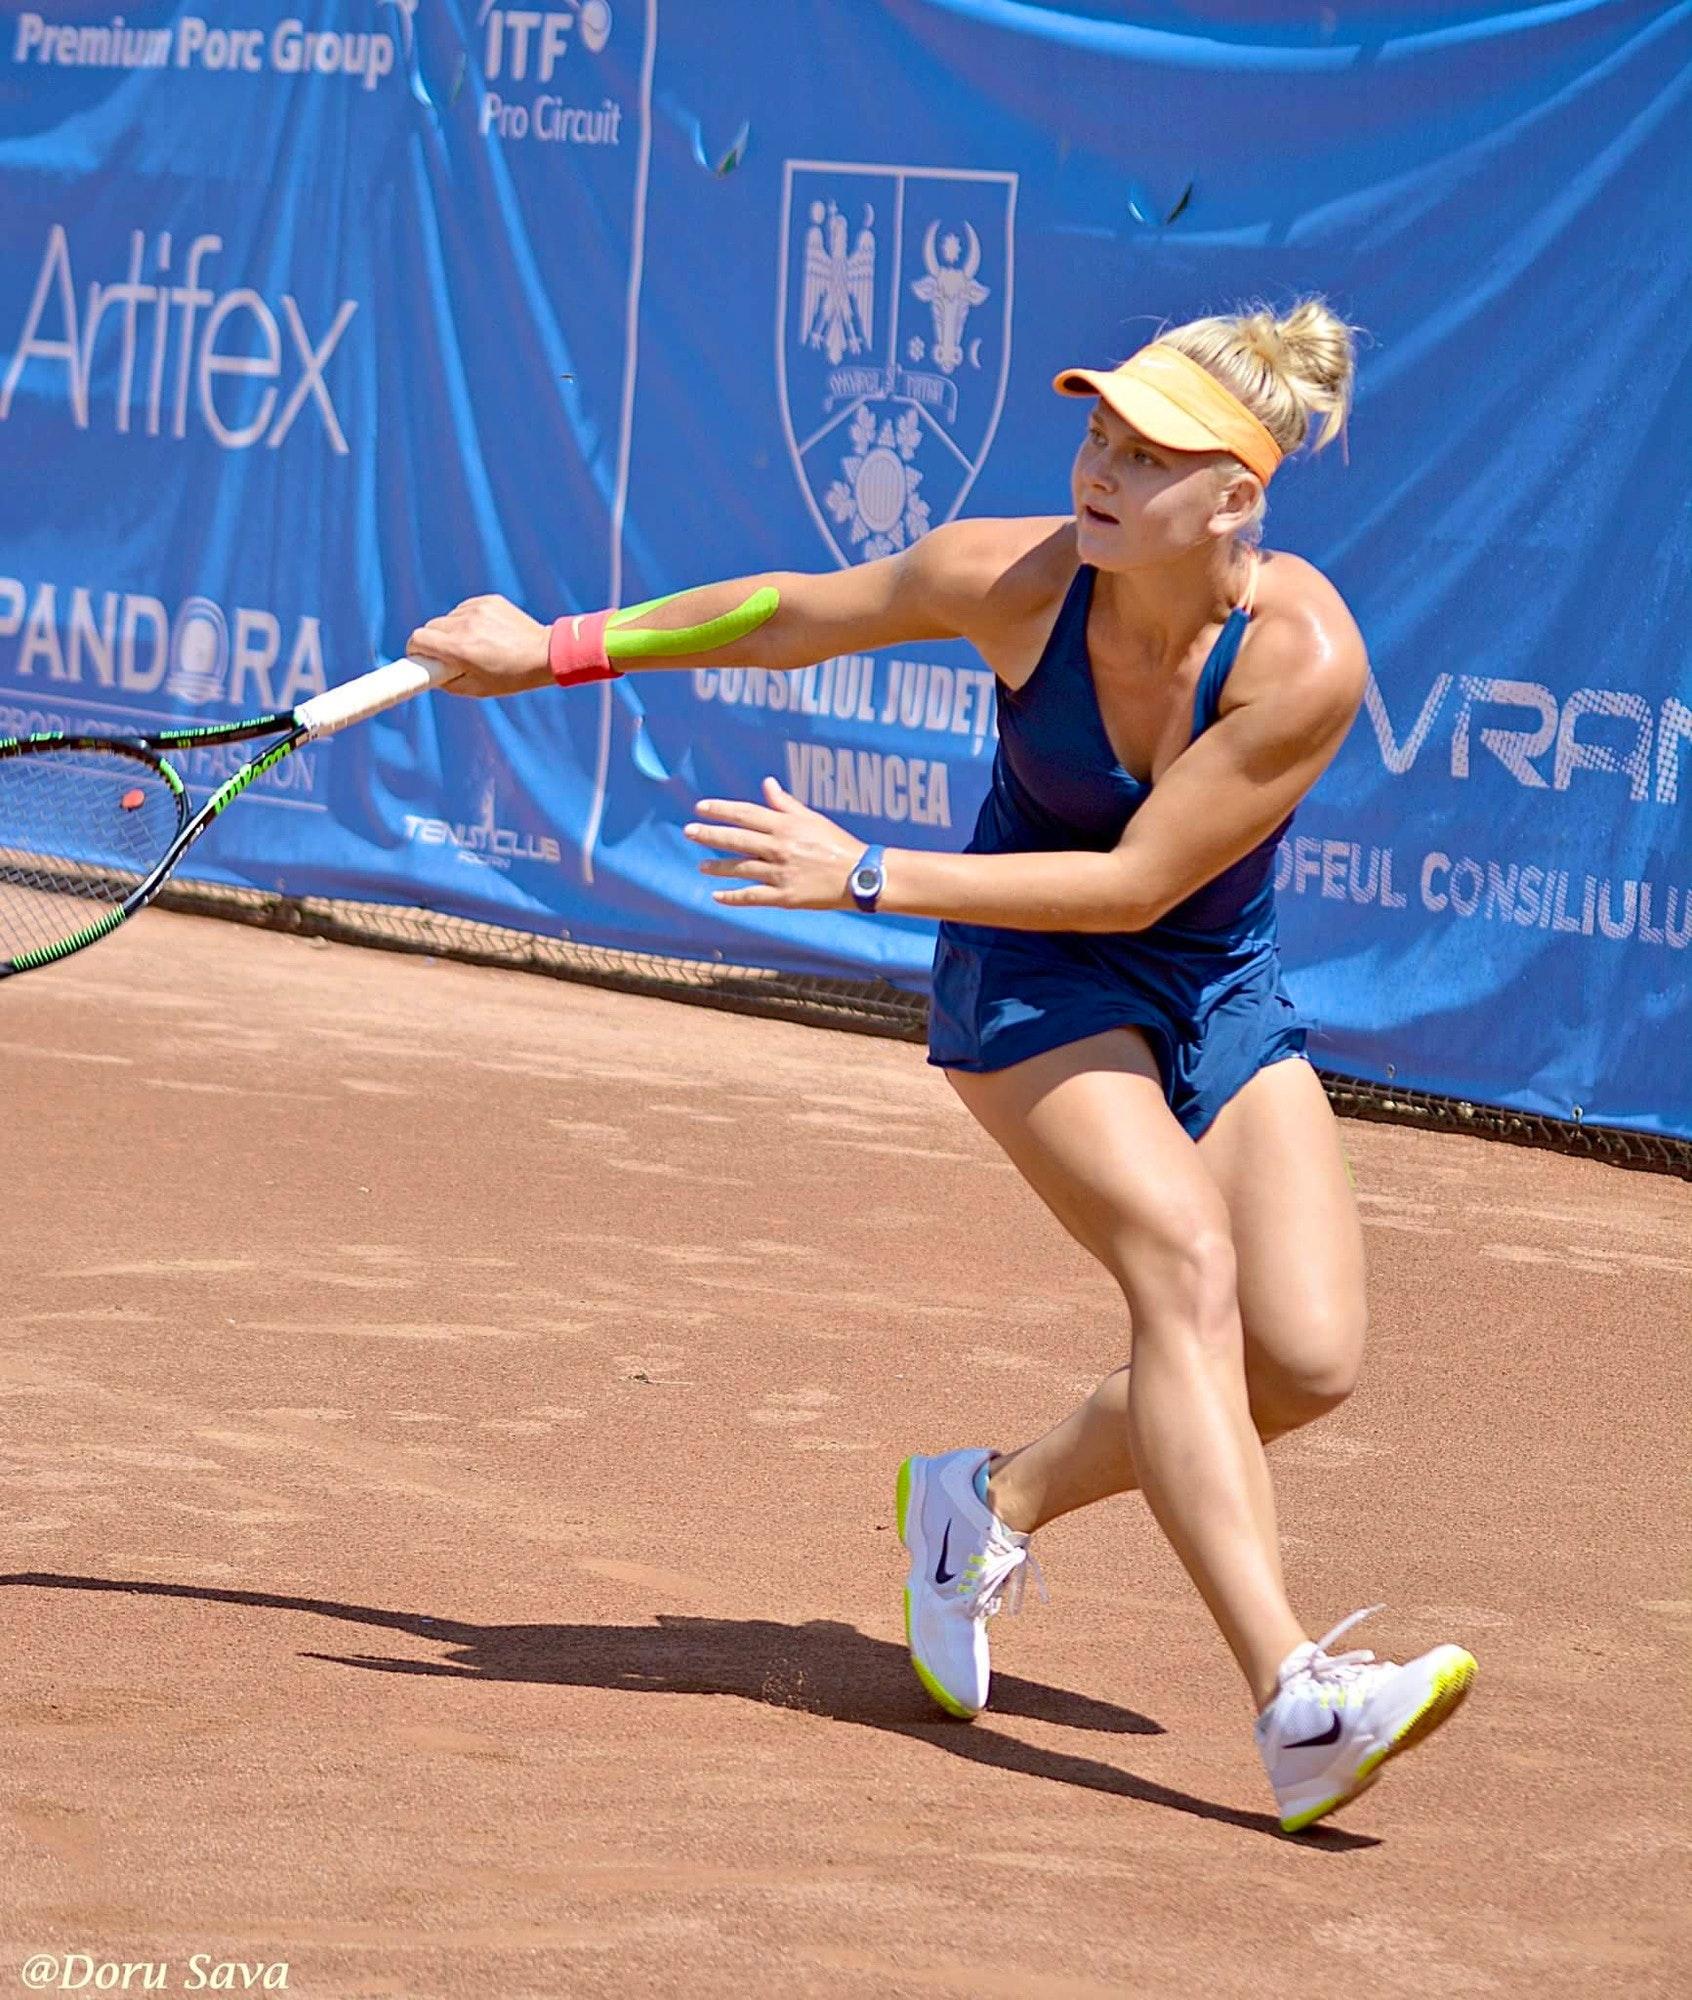 Sasha P. teaches tennis lessons in Stamford, CT